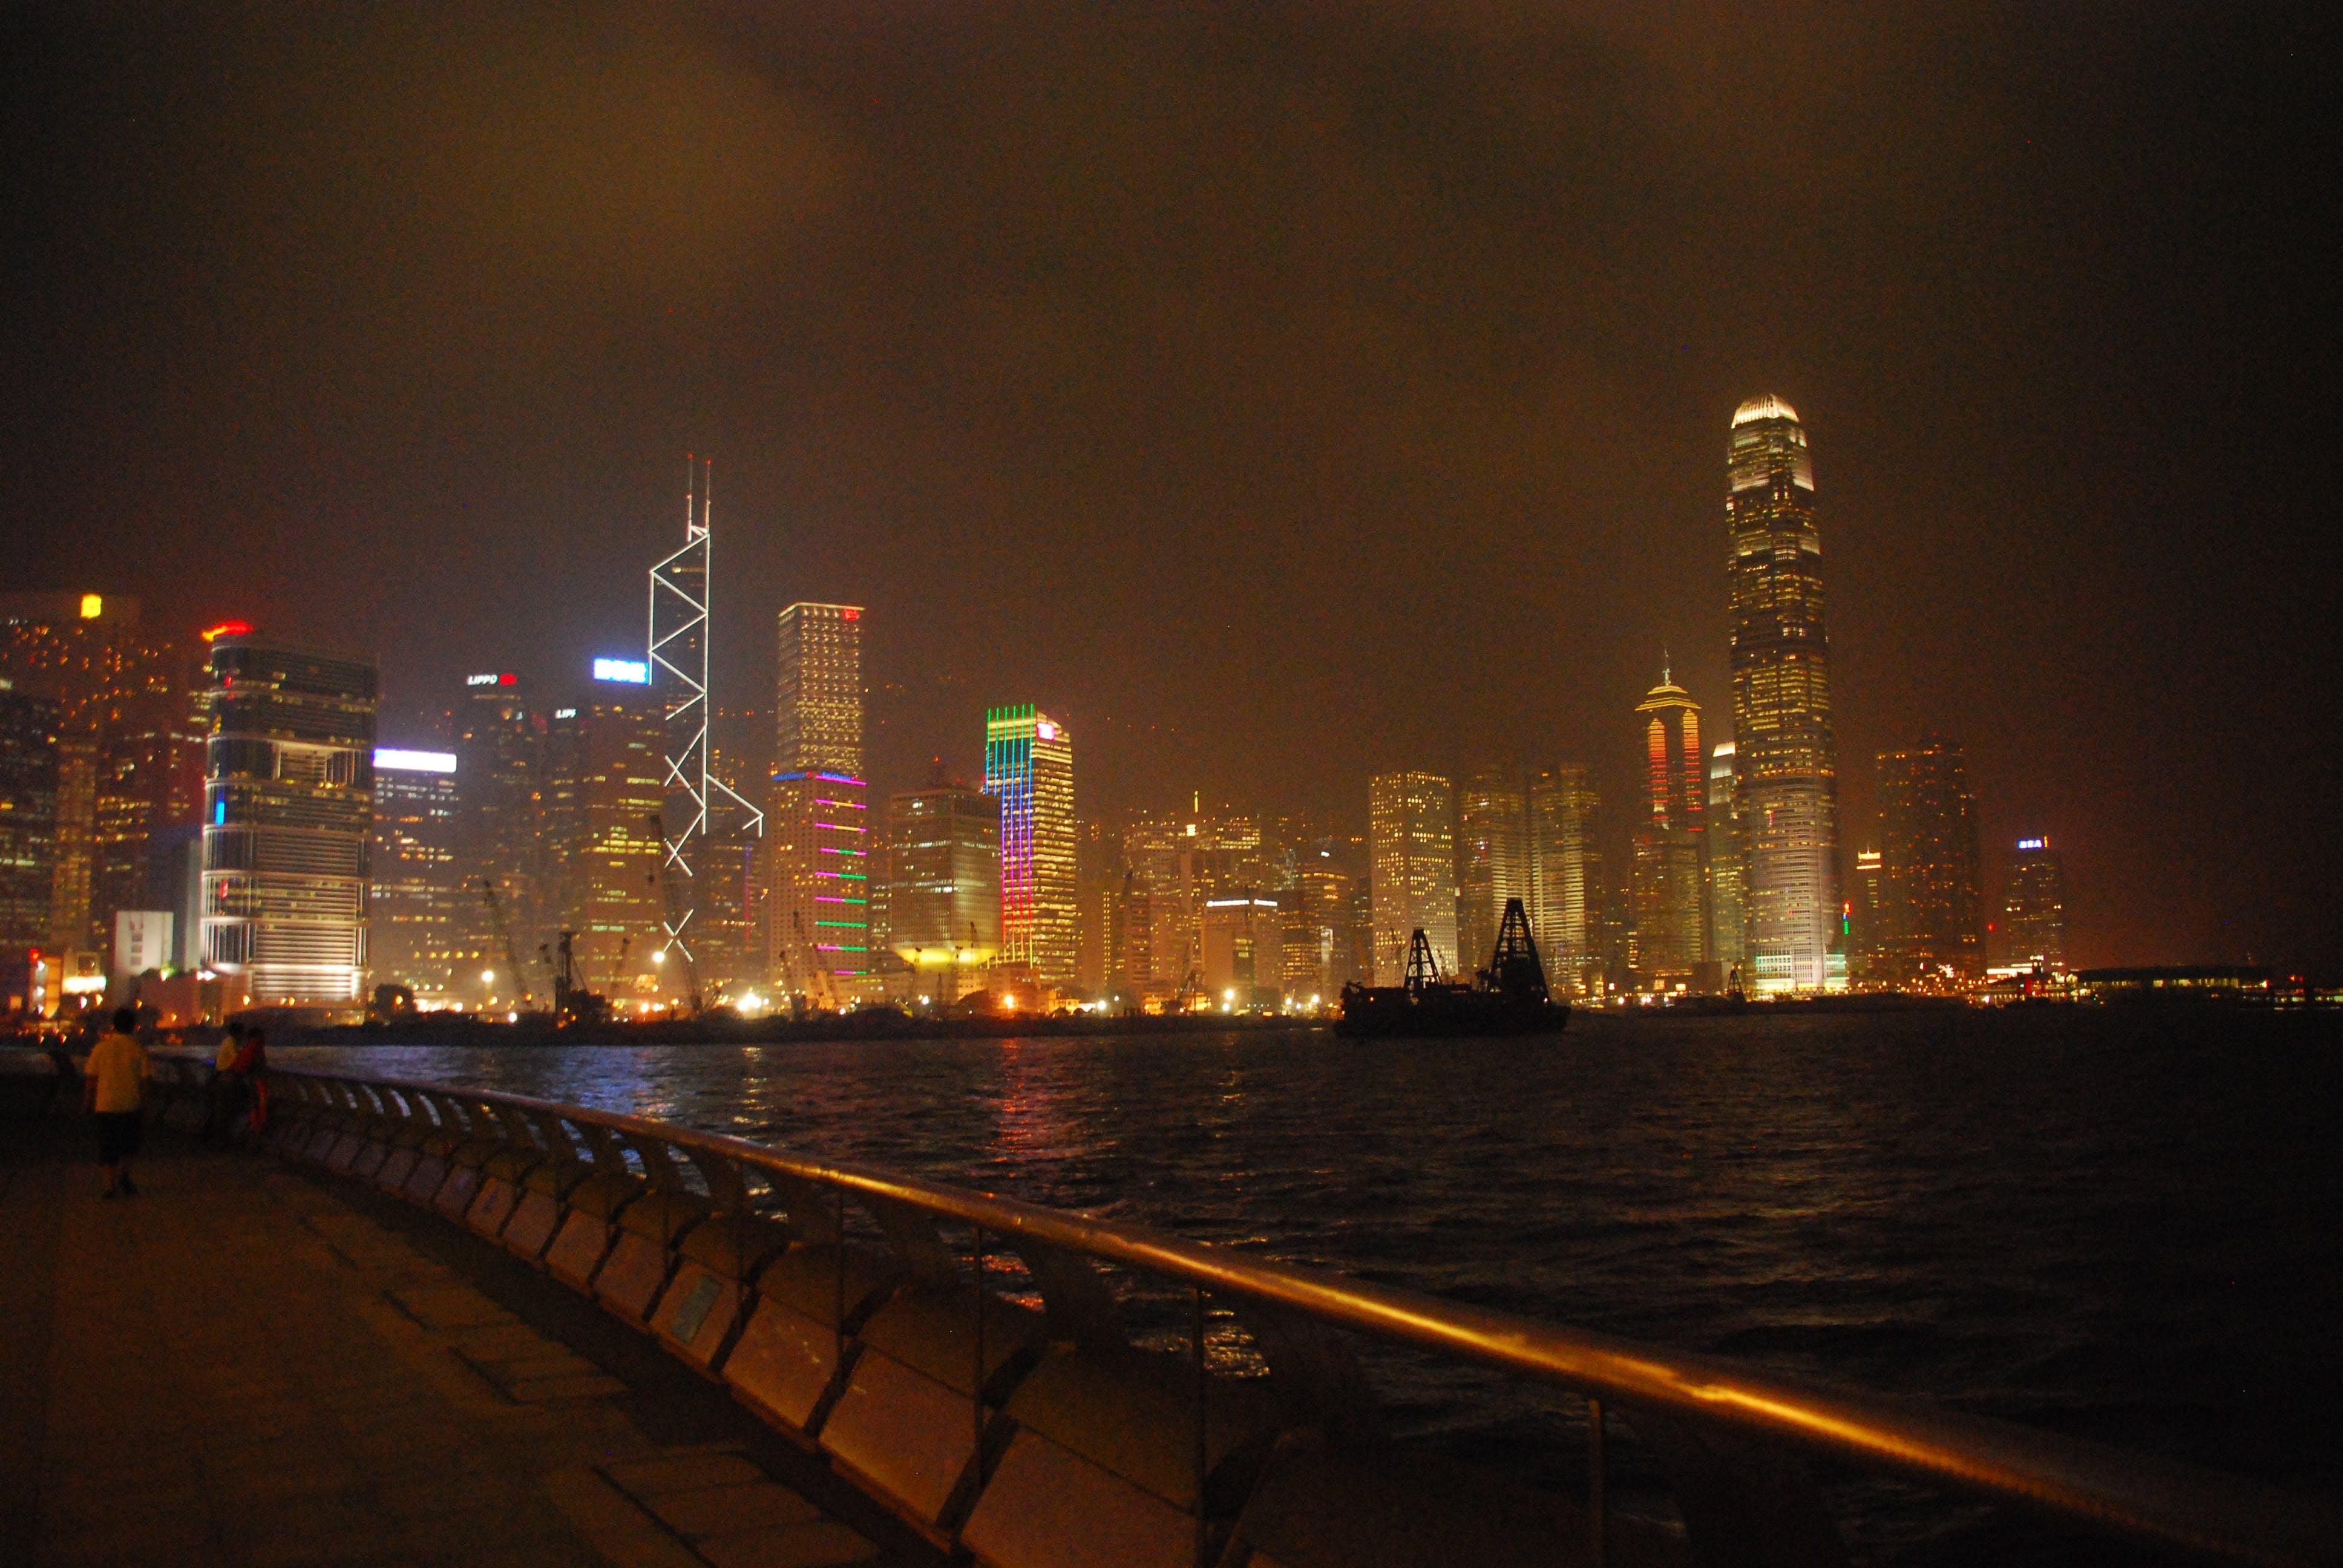 Free stock photo of city, night, buildings, building